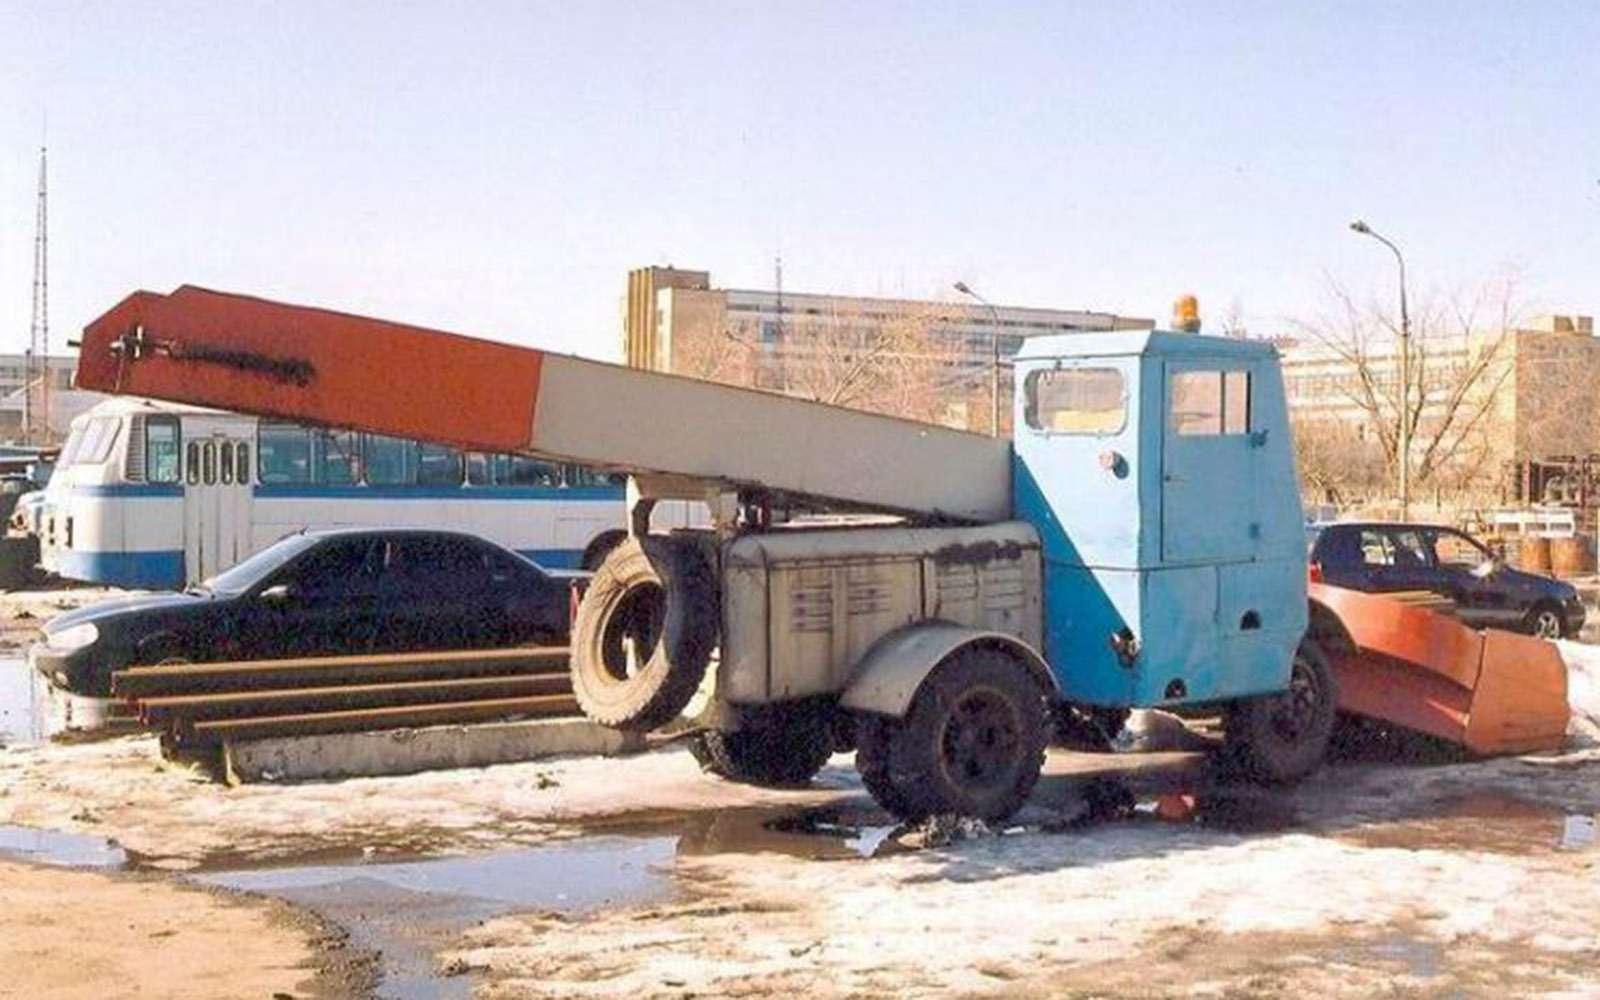 Наколесах игусеницах: Ягуар набазе УАЗа, ГАЗ-51— «золотые ручки», царь-танк— фото 705741